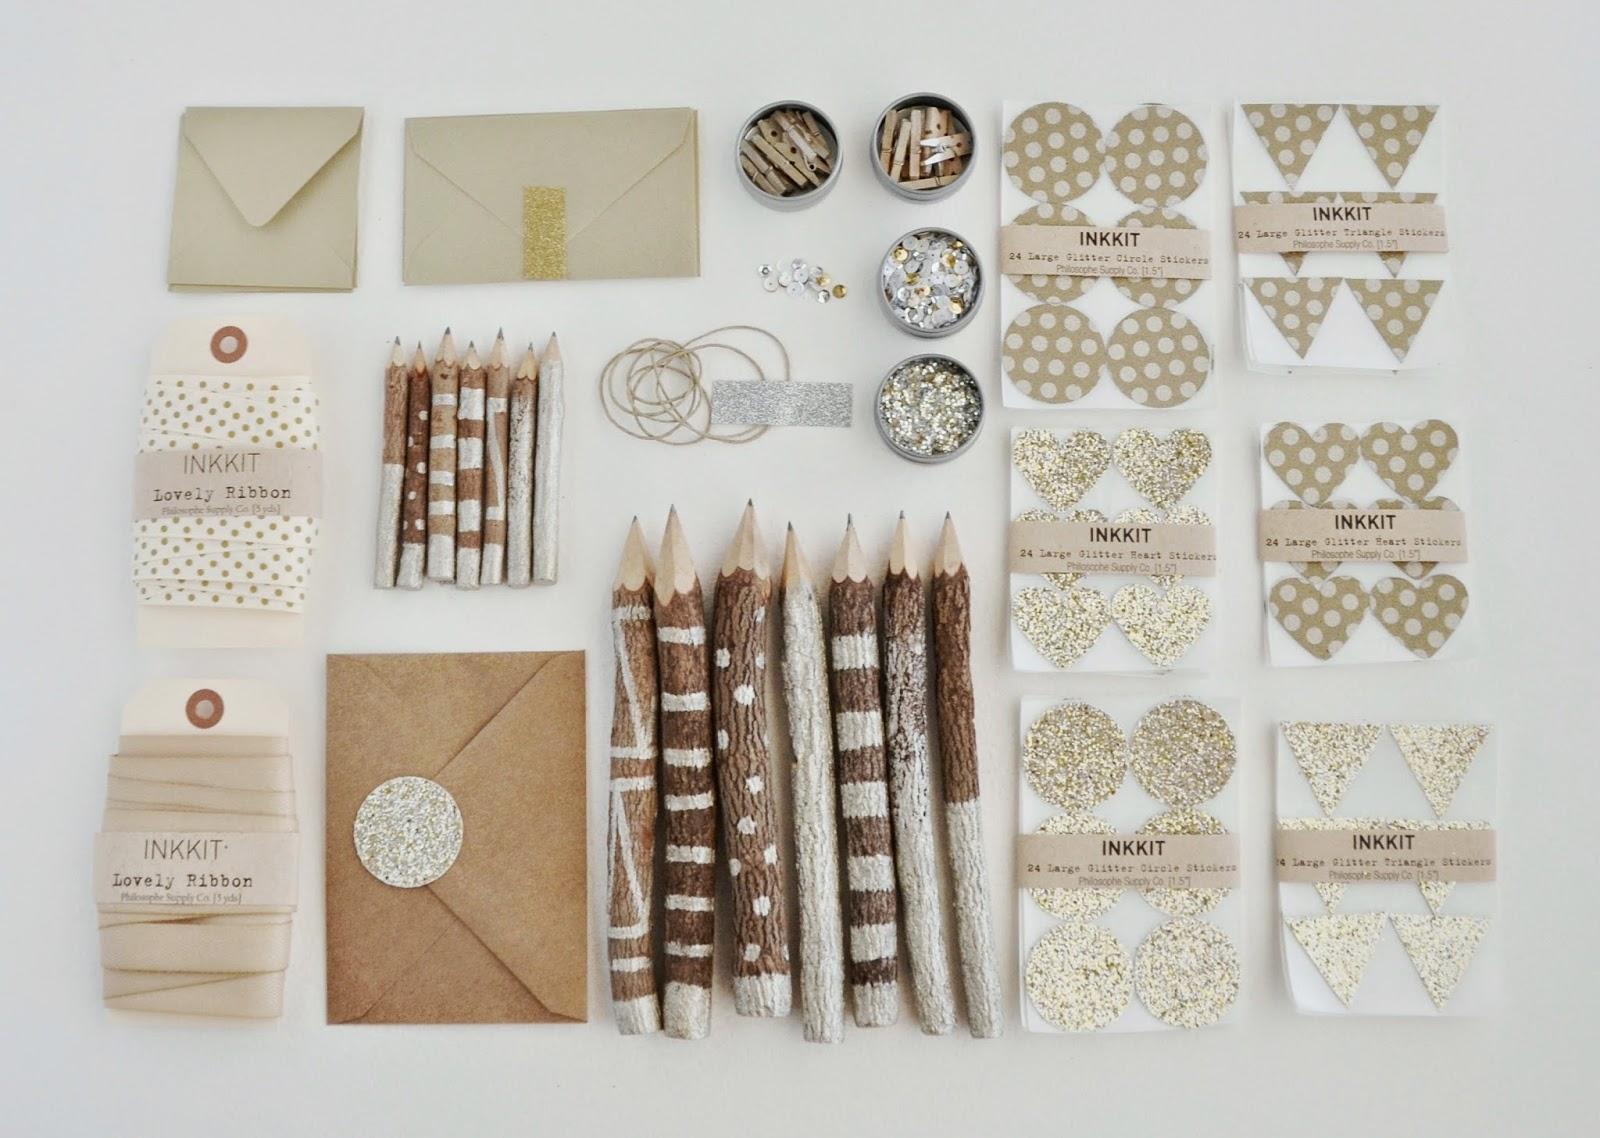 Inkkit craft supplies